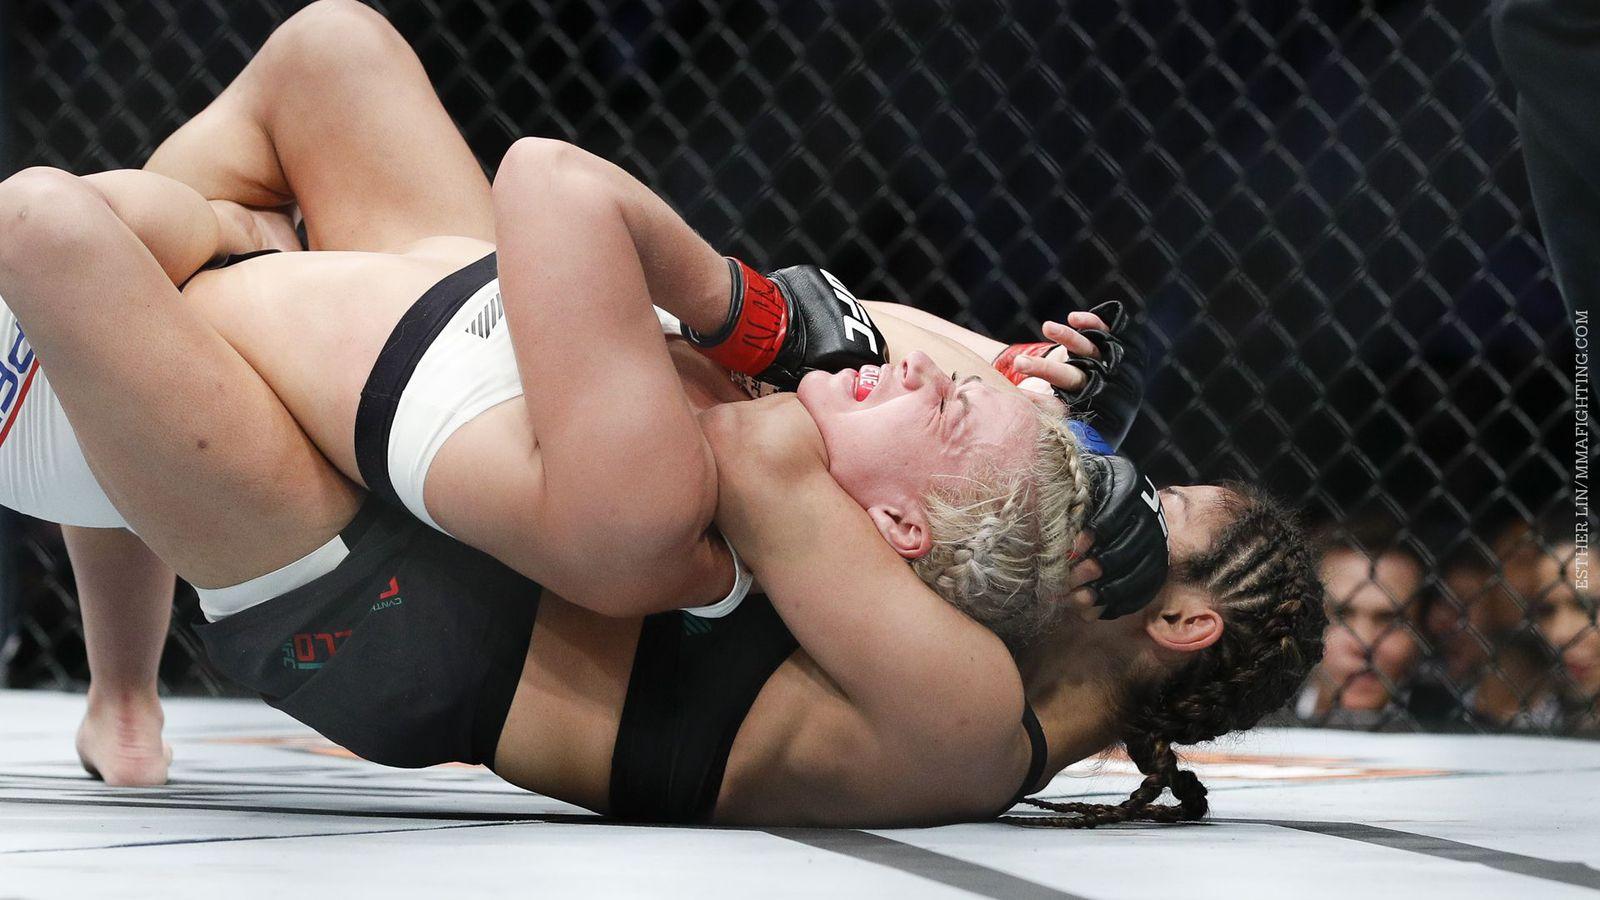 Mma fight cindy vs headgear guy 7